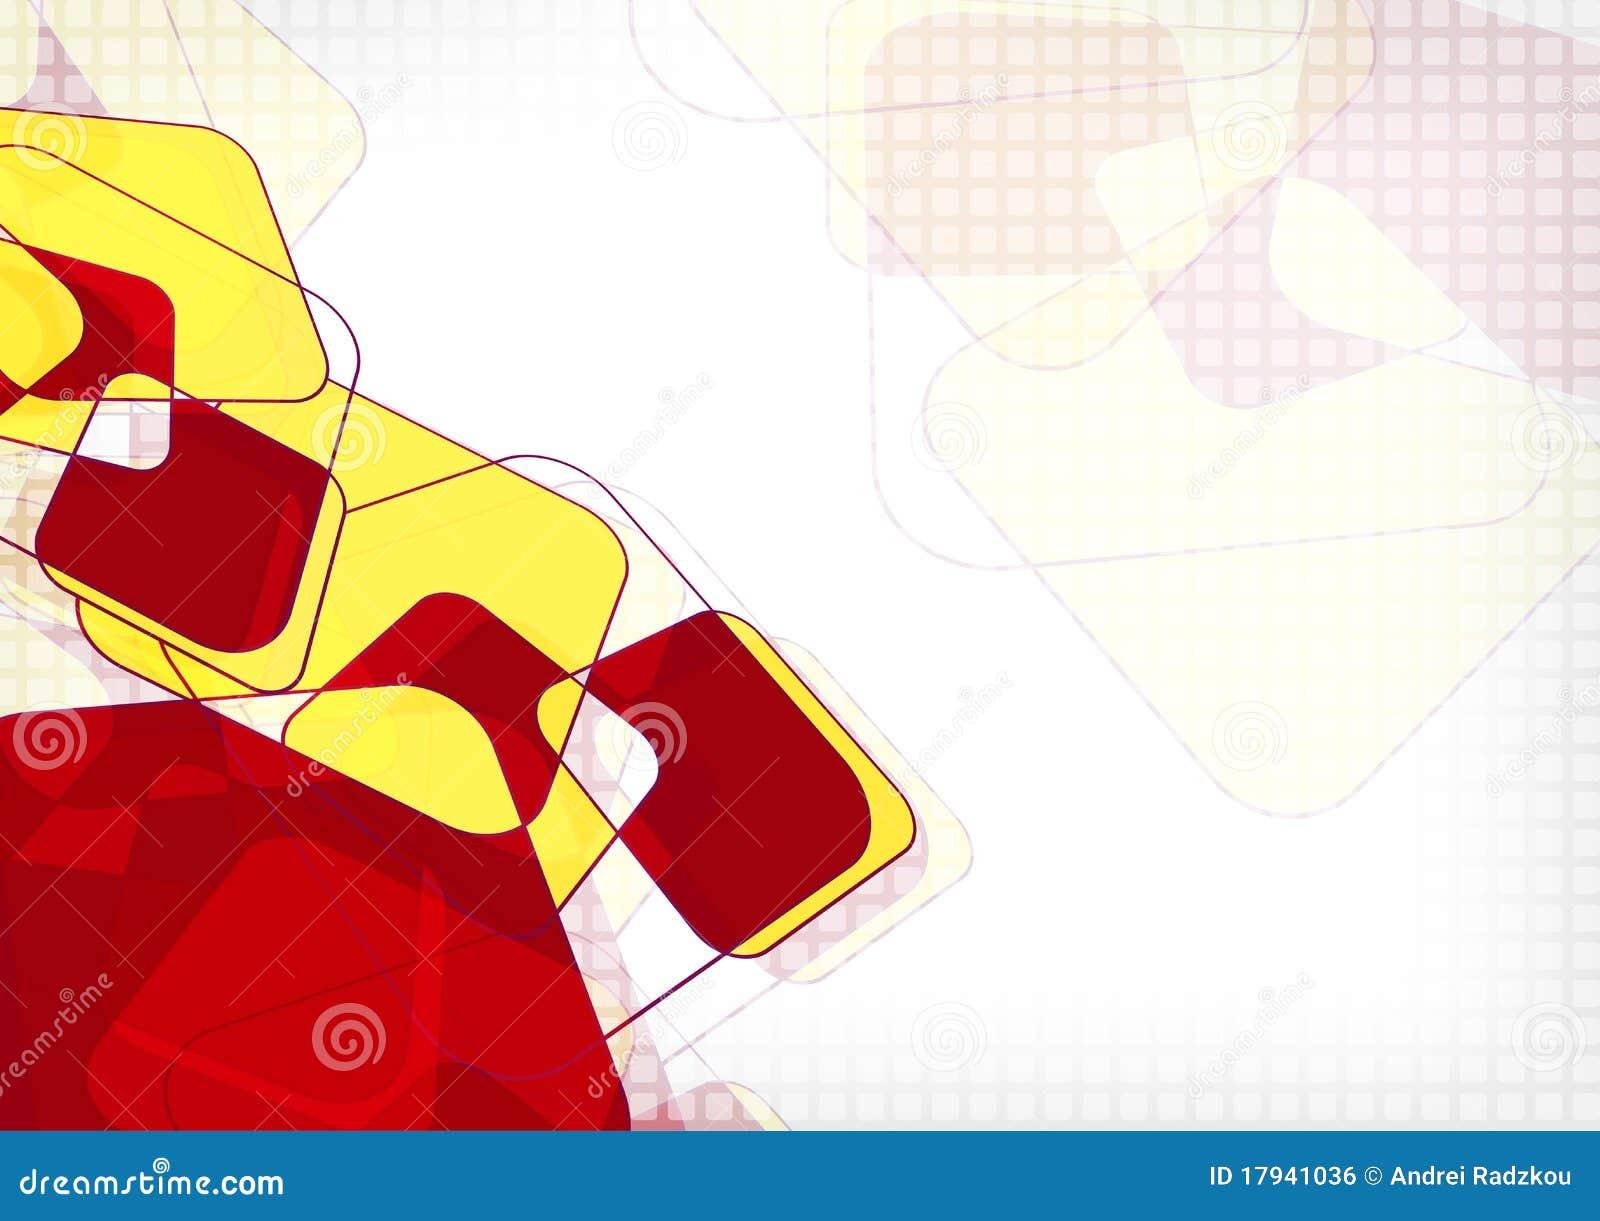 Immagine stock libera da diritti: astrazione geometrica